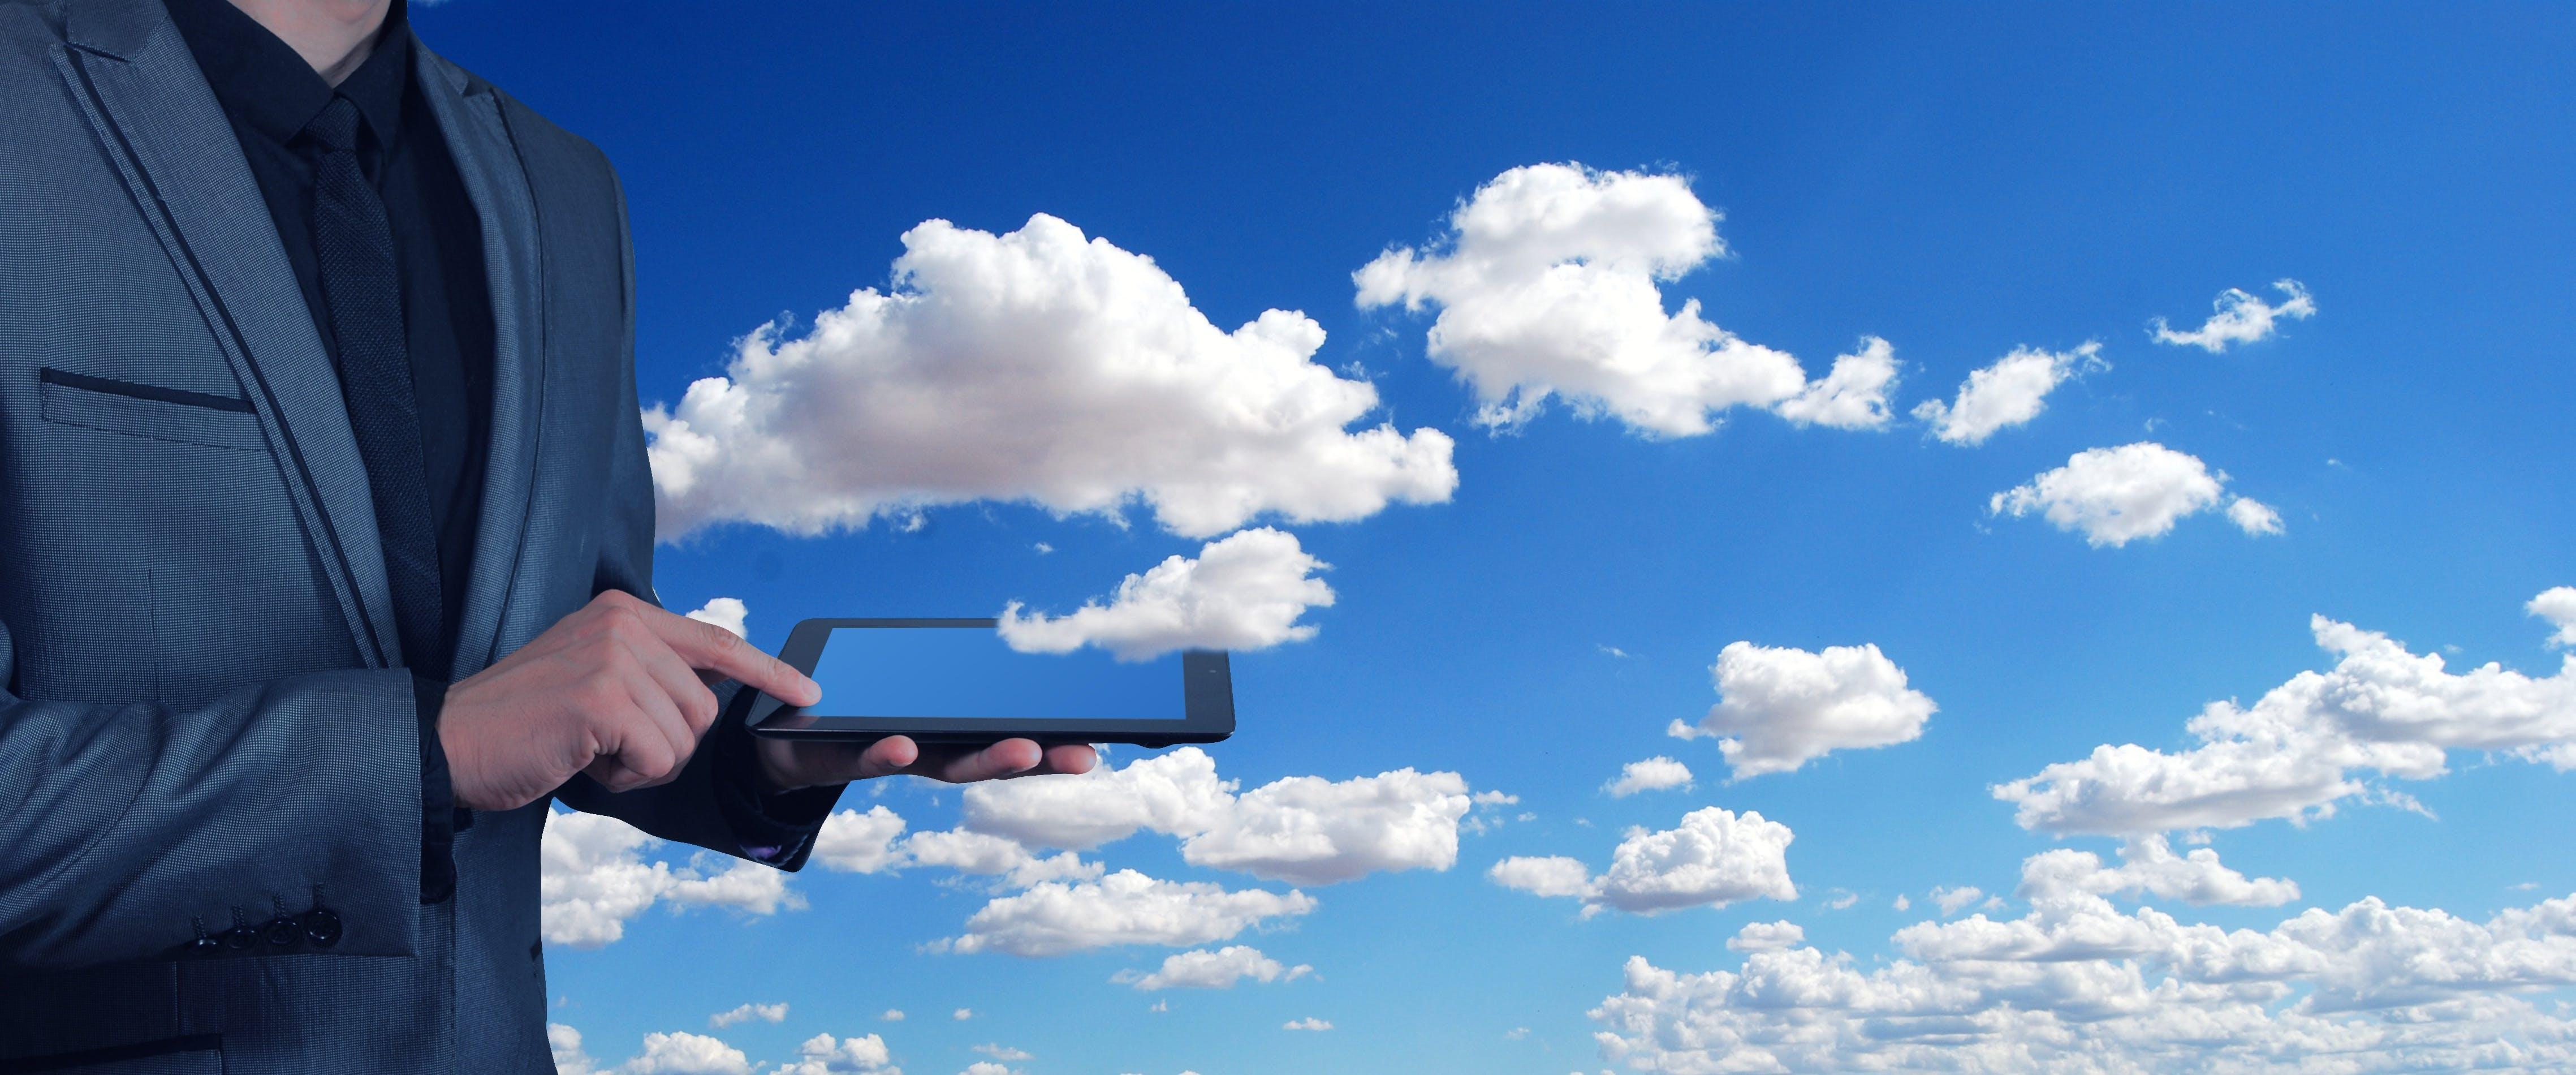 Titelbild-Office-365-O365-Cloud-Mann-Business-Tablet-Finger-pixabay-3599916-geralt